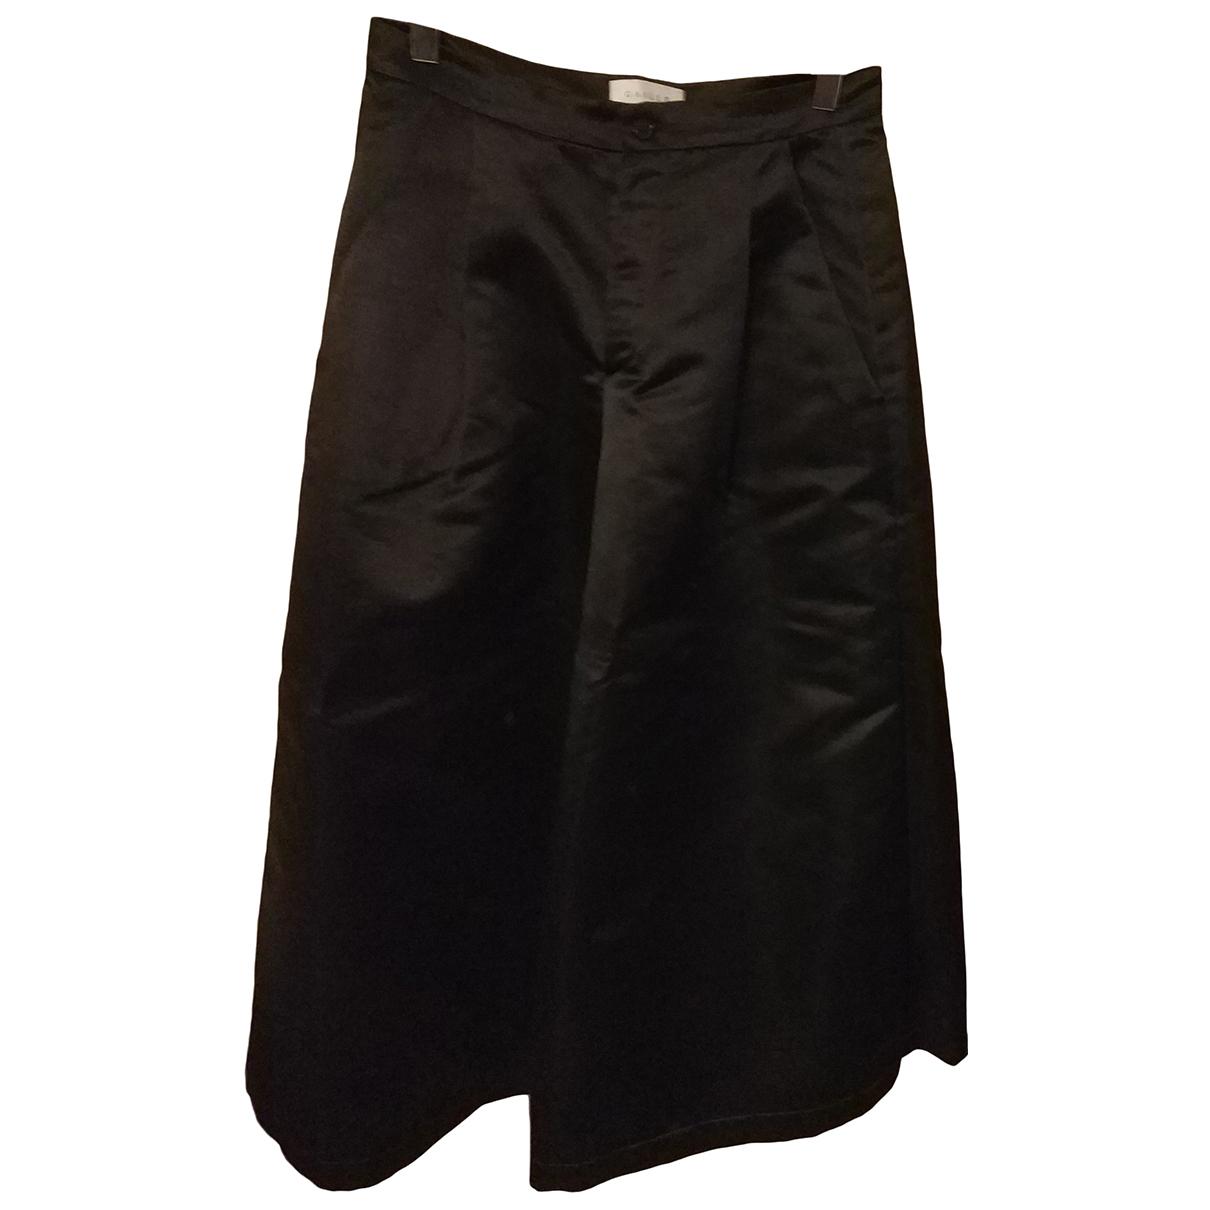 Gaelle Paris N Black Trousers for Women 1 0-5